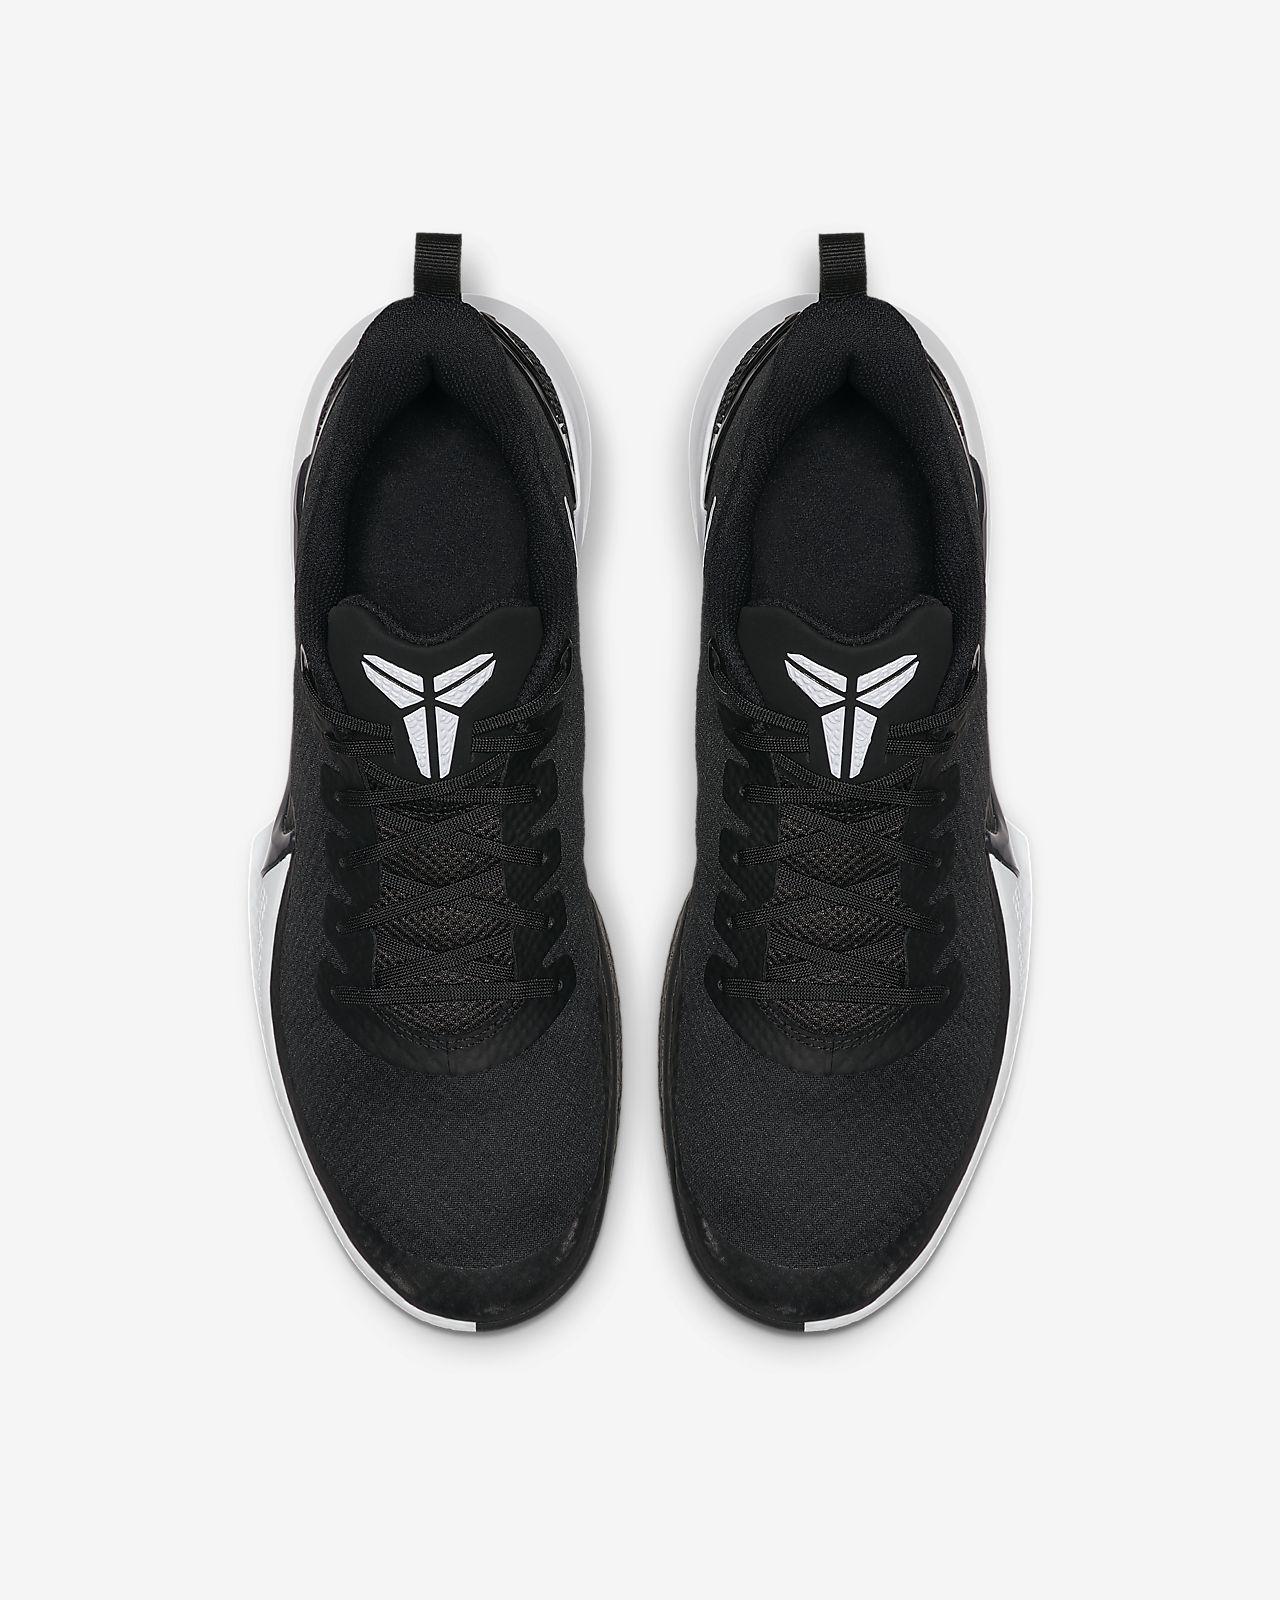 detailing 70b64 14a96 Low Resolution Mamba Focus Basketball Shoe Mamba Focus Basketball Shoe